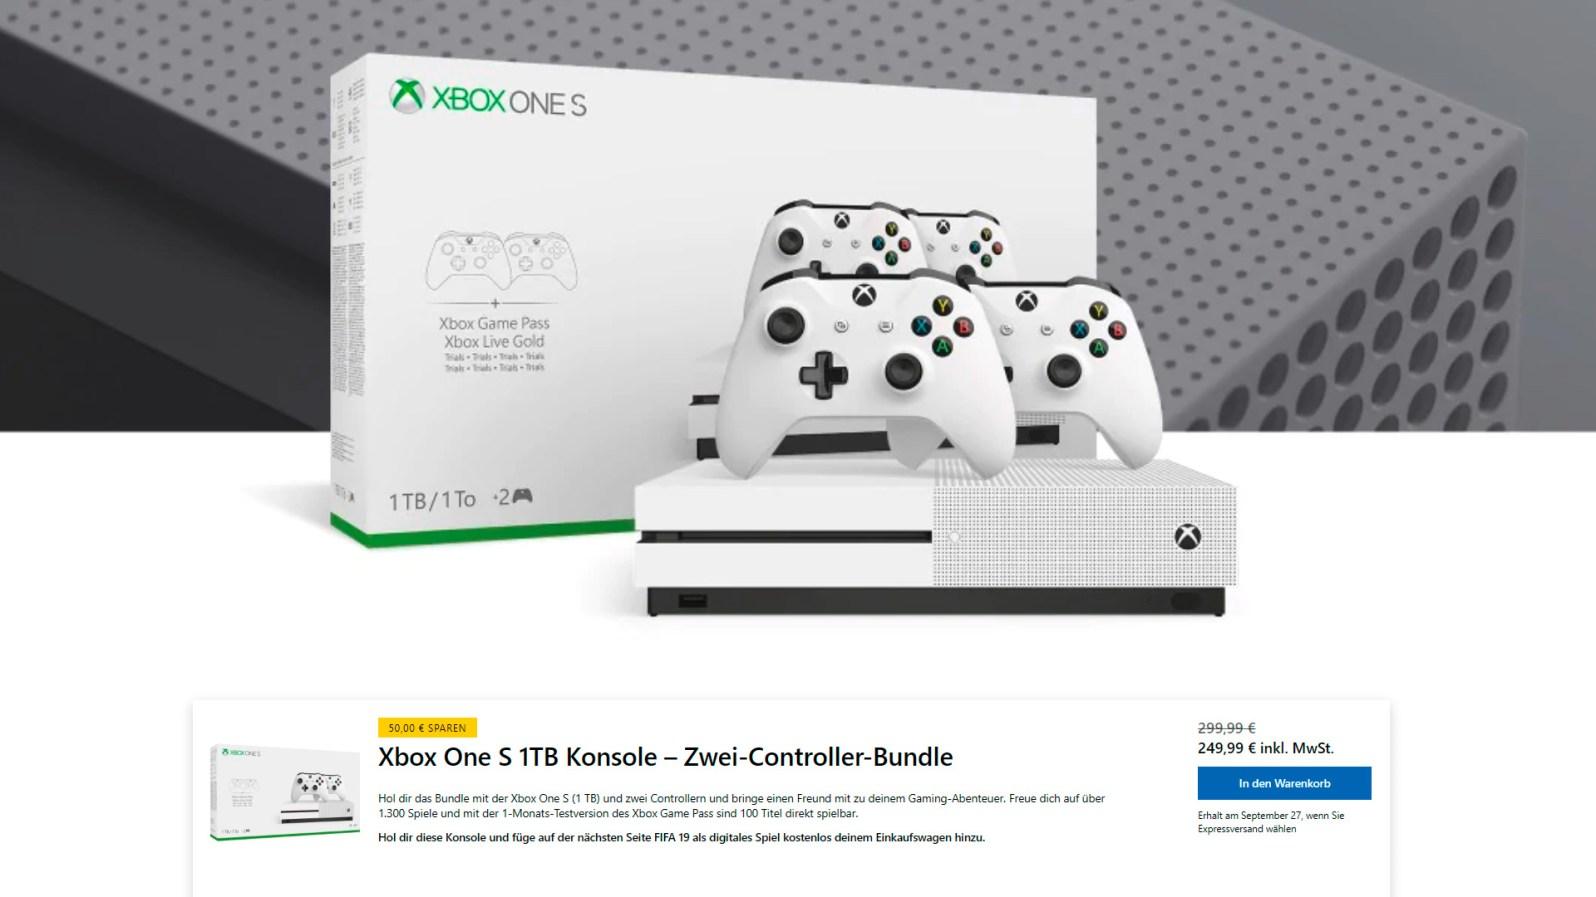 Xbox One S 1TB Konsole - Zwei-Controller-Bundle